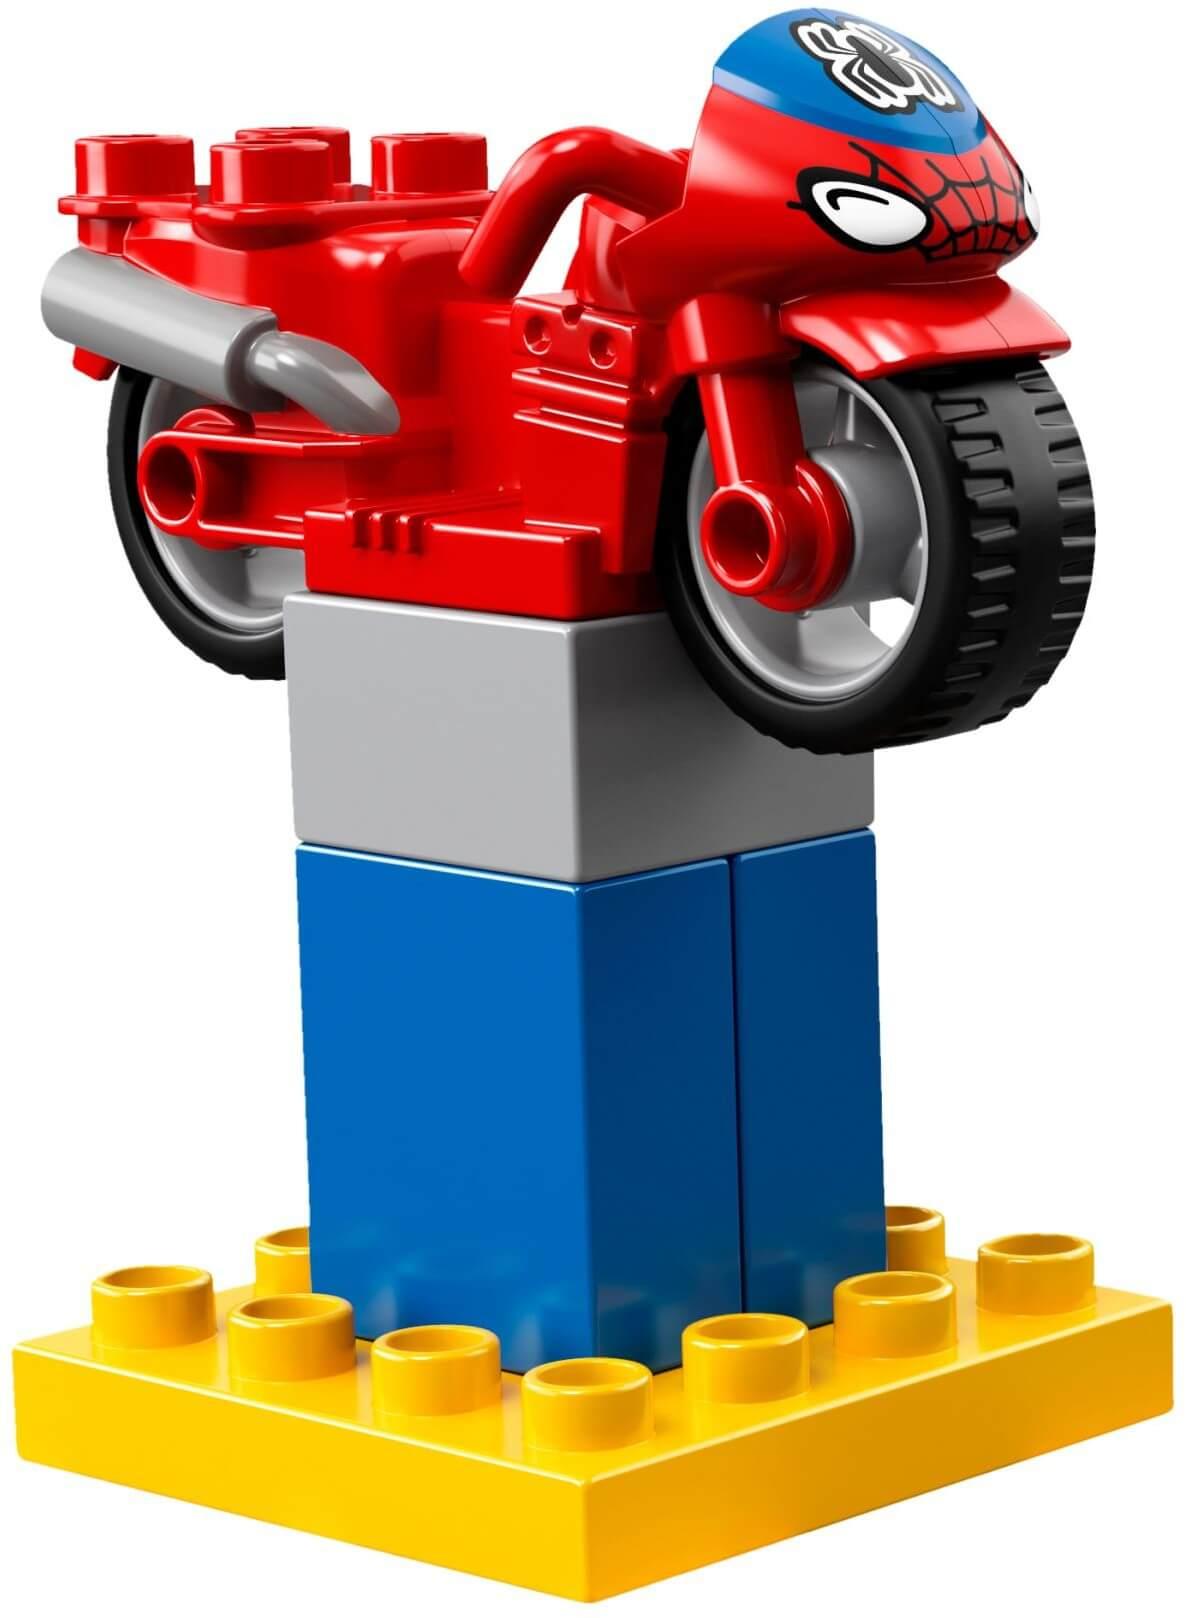 Mua đồ chơi LEGO 10876 - LEGO Duplo 10876 - Spider-Man và Hulk Đại Chiến (LEGO Duplo 10876 Spider-Man & Hulk Adventures)